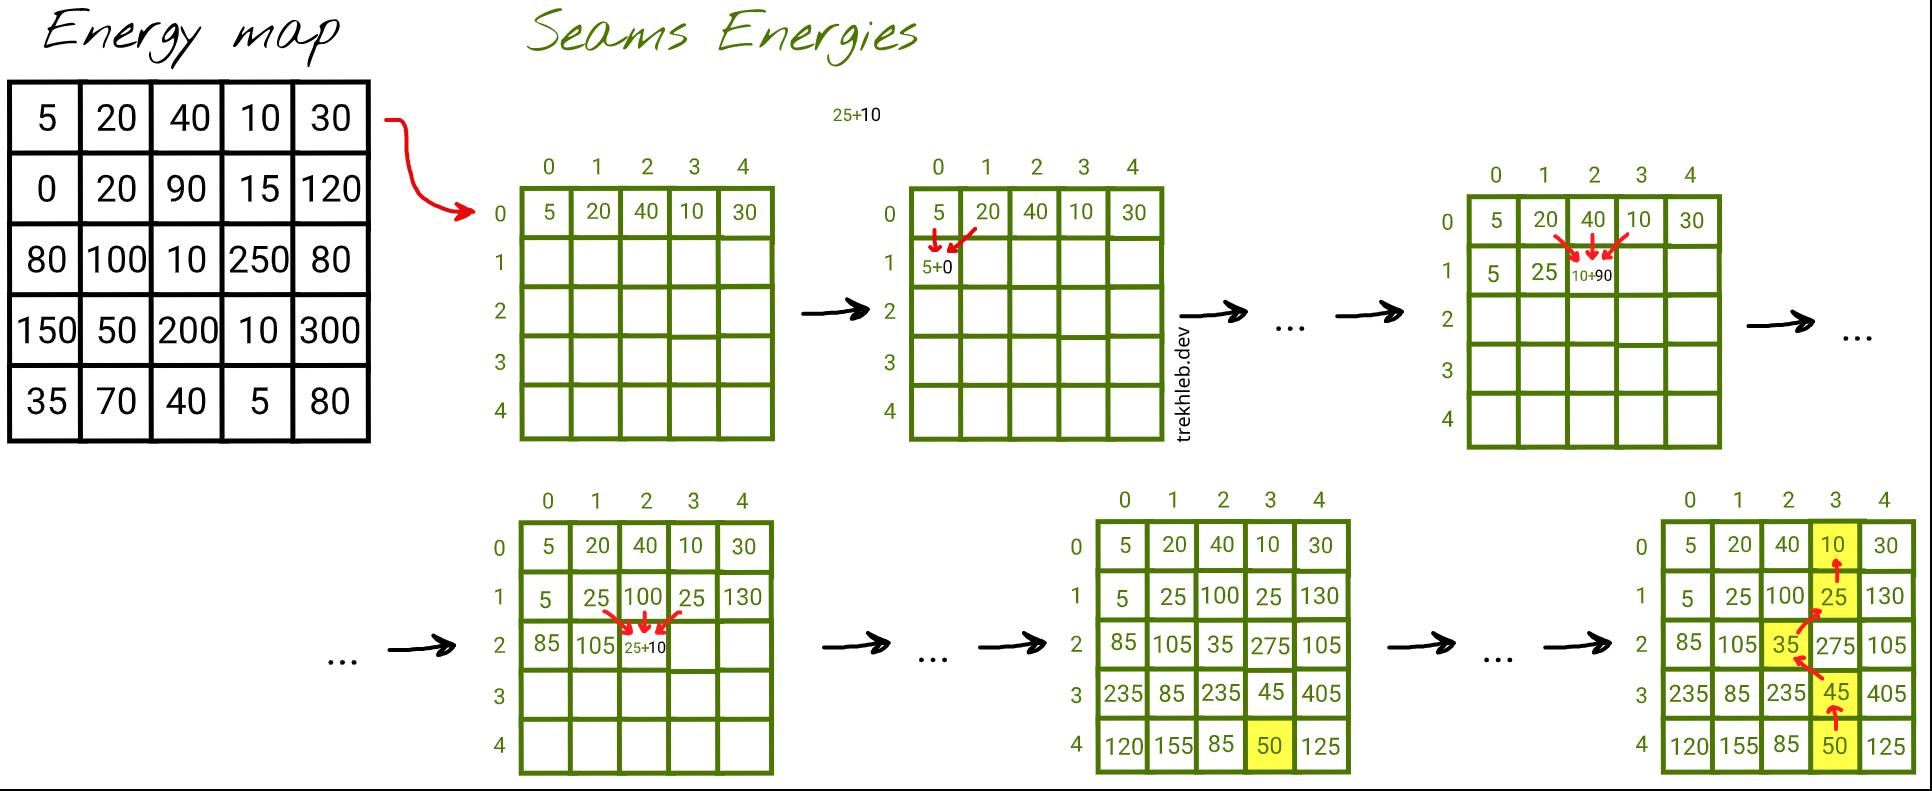 Seams energies map traversal